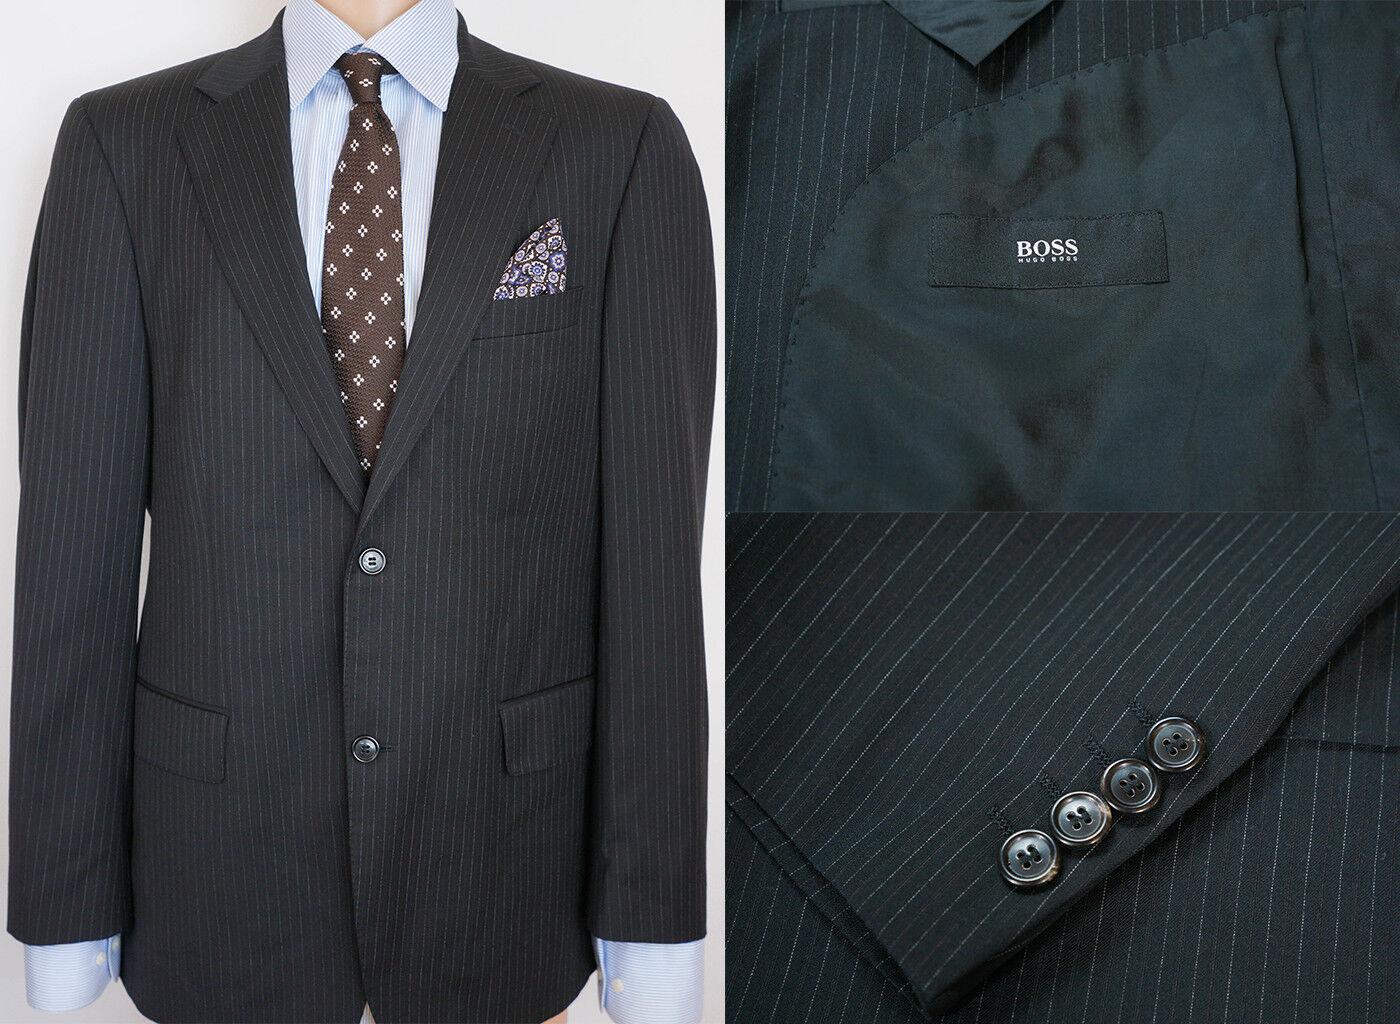 Herren Hugo Boss Jacke Blazer Cooper Reno Schwarze Wolle L It50 Us UK 40 Qaa134